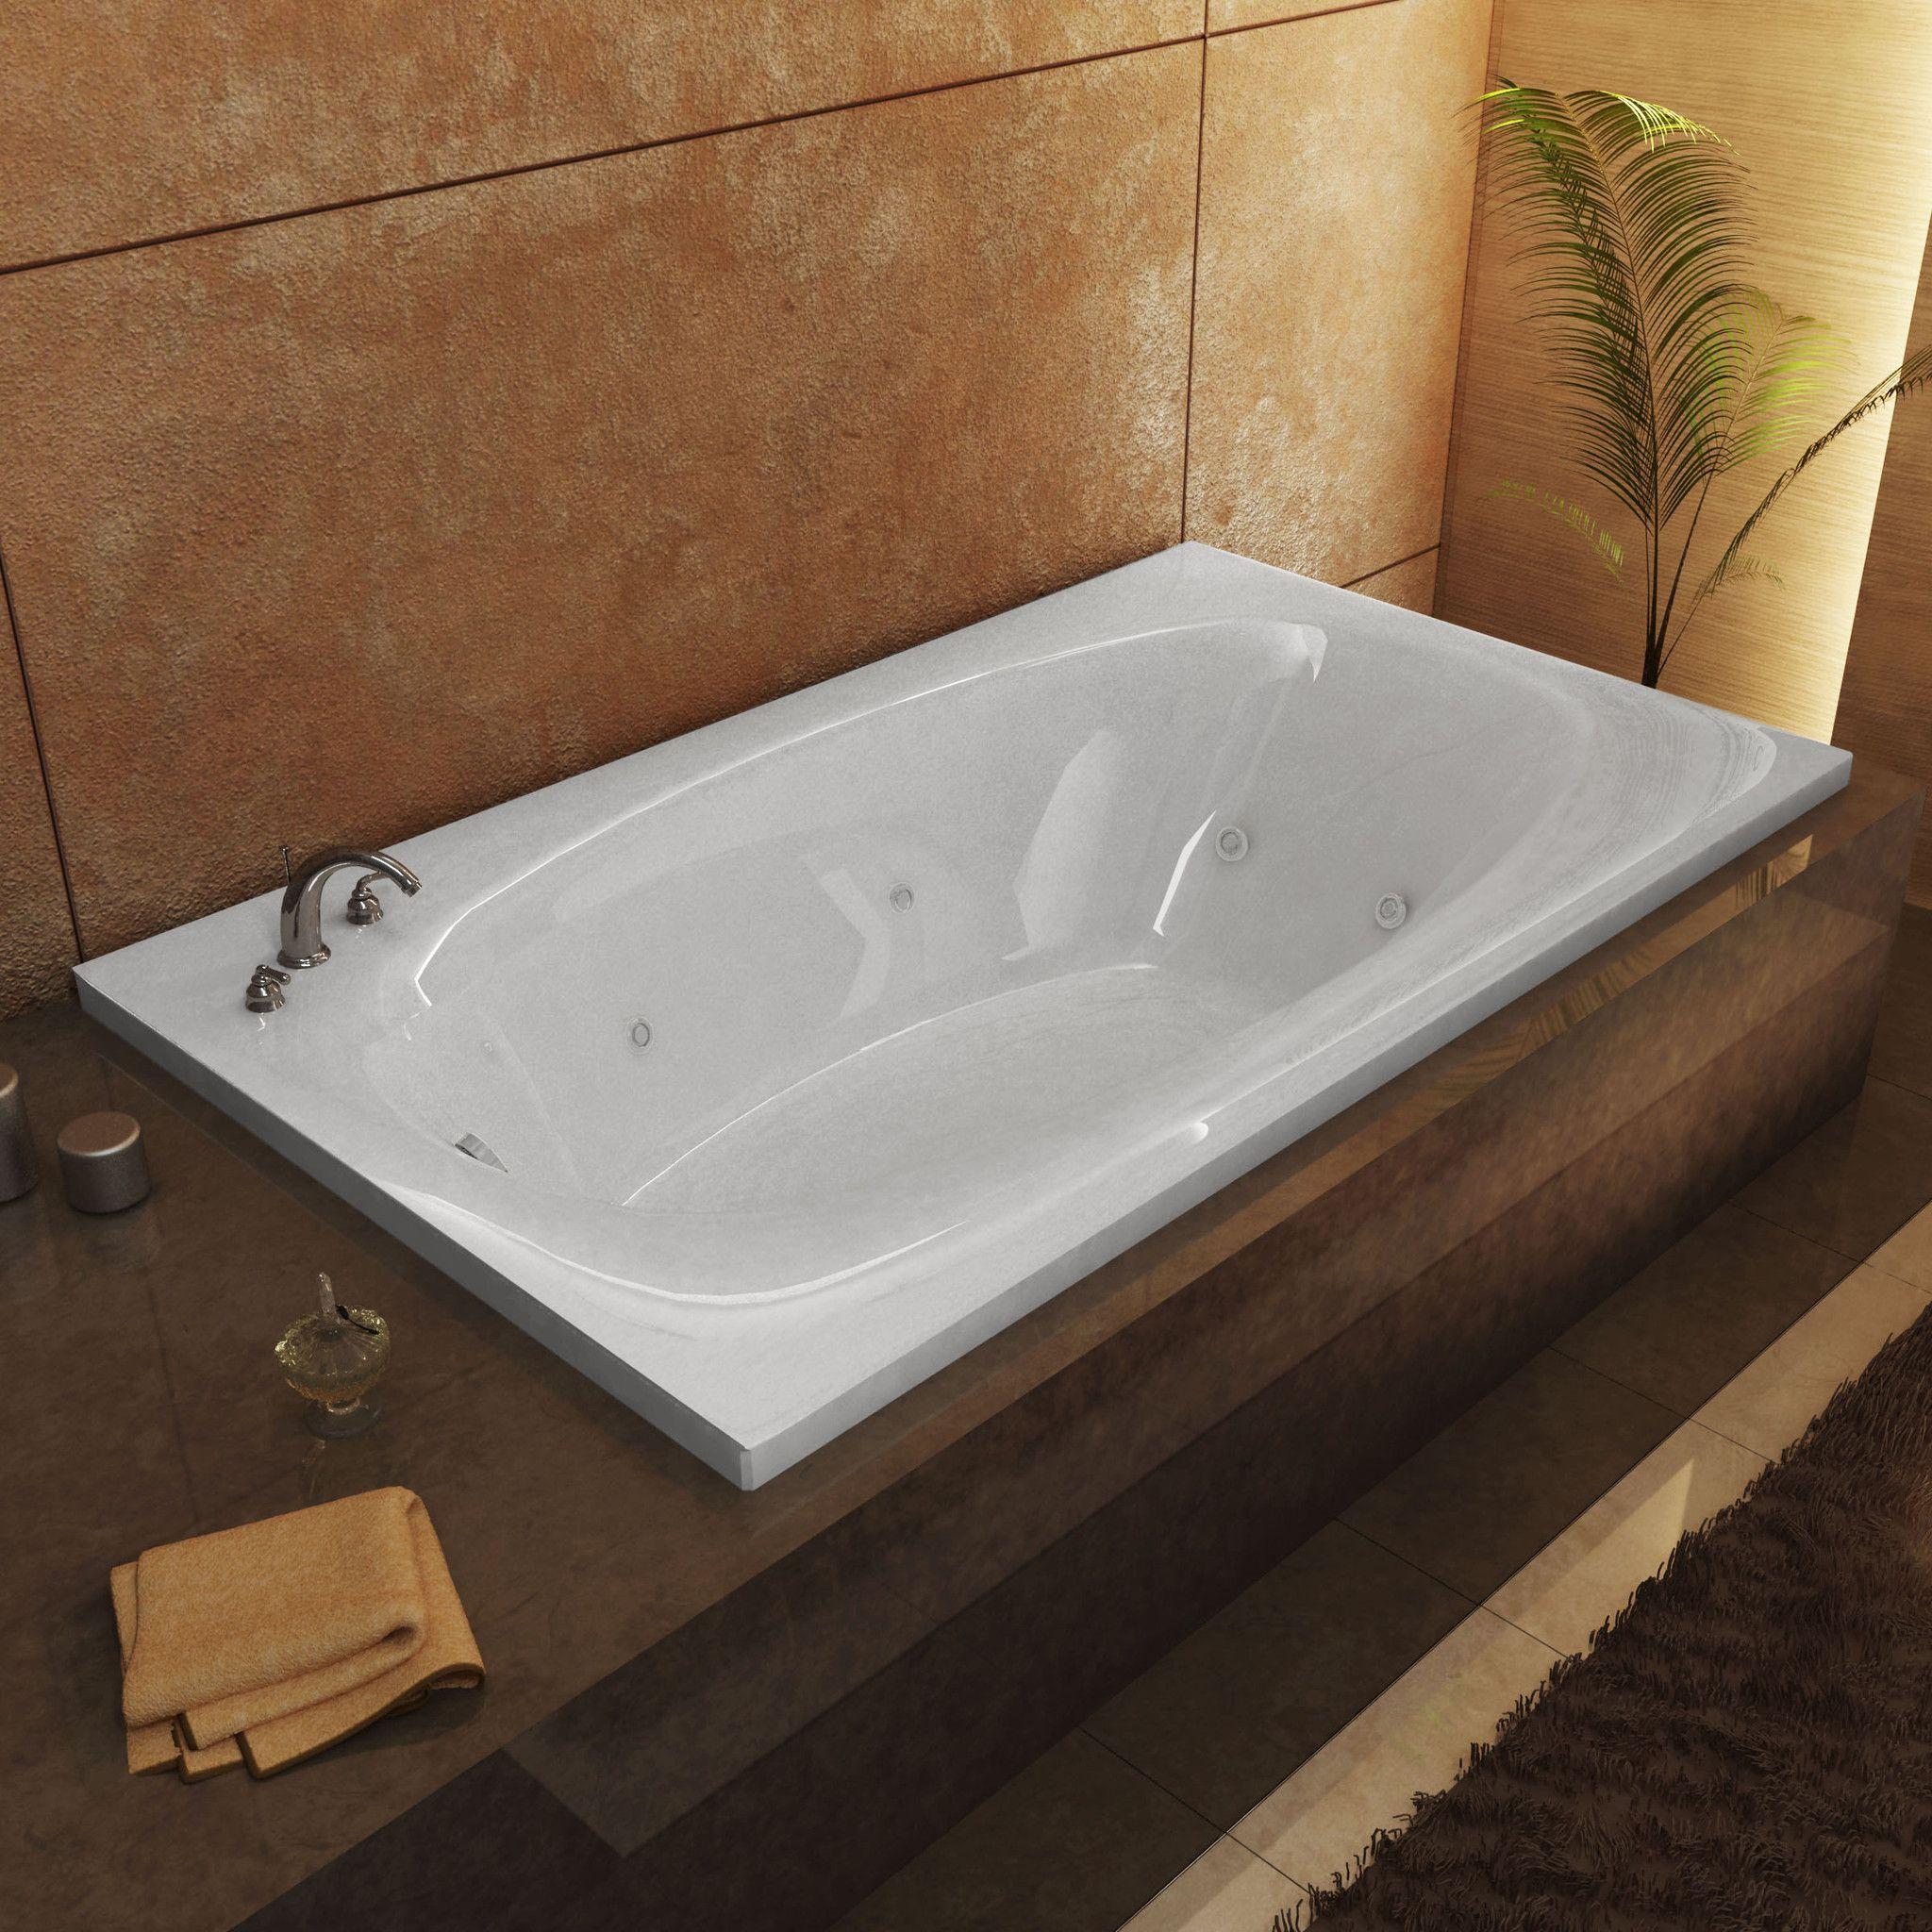 Superb Venzi VZ3666PWL Talia 36 X 66 Rectangular Whirlpool Jetted Bathtub With  Left Drain